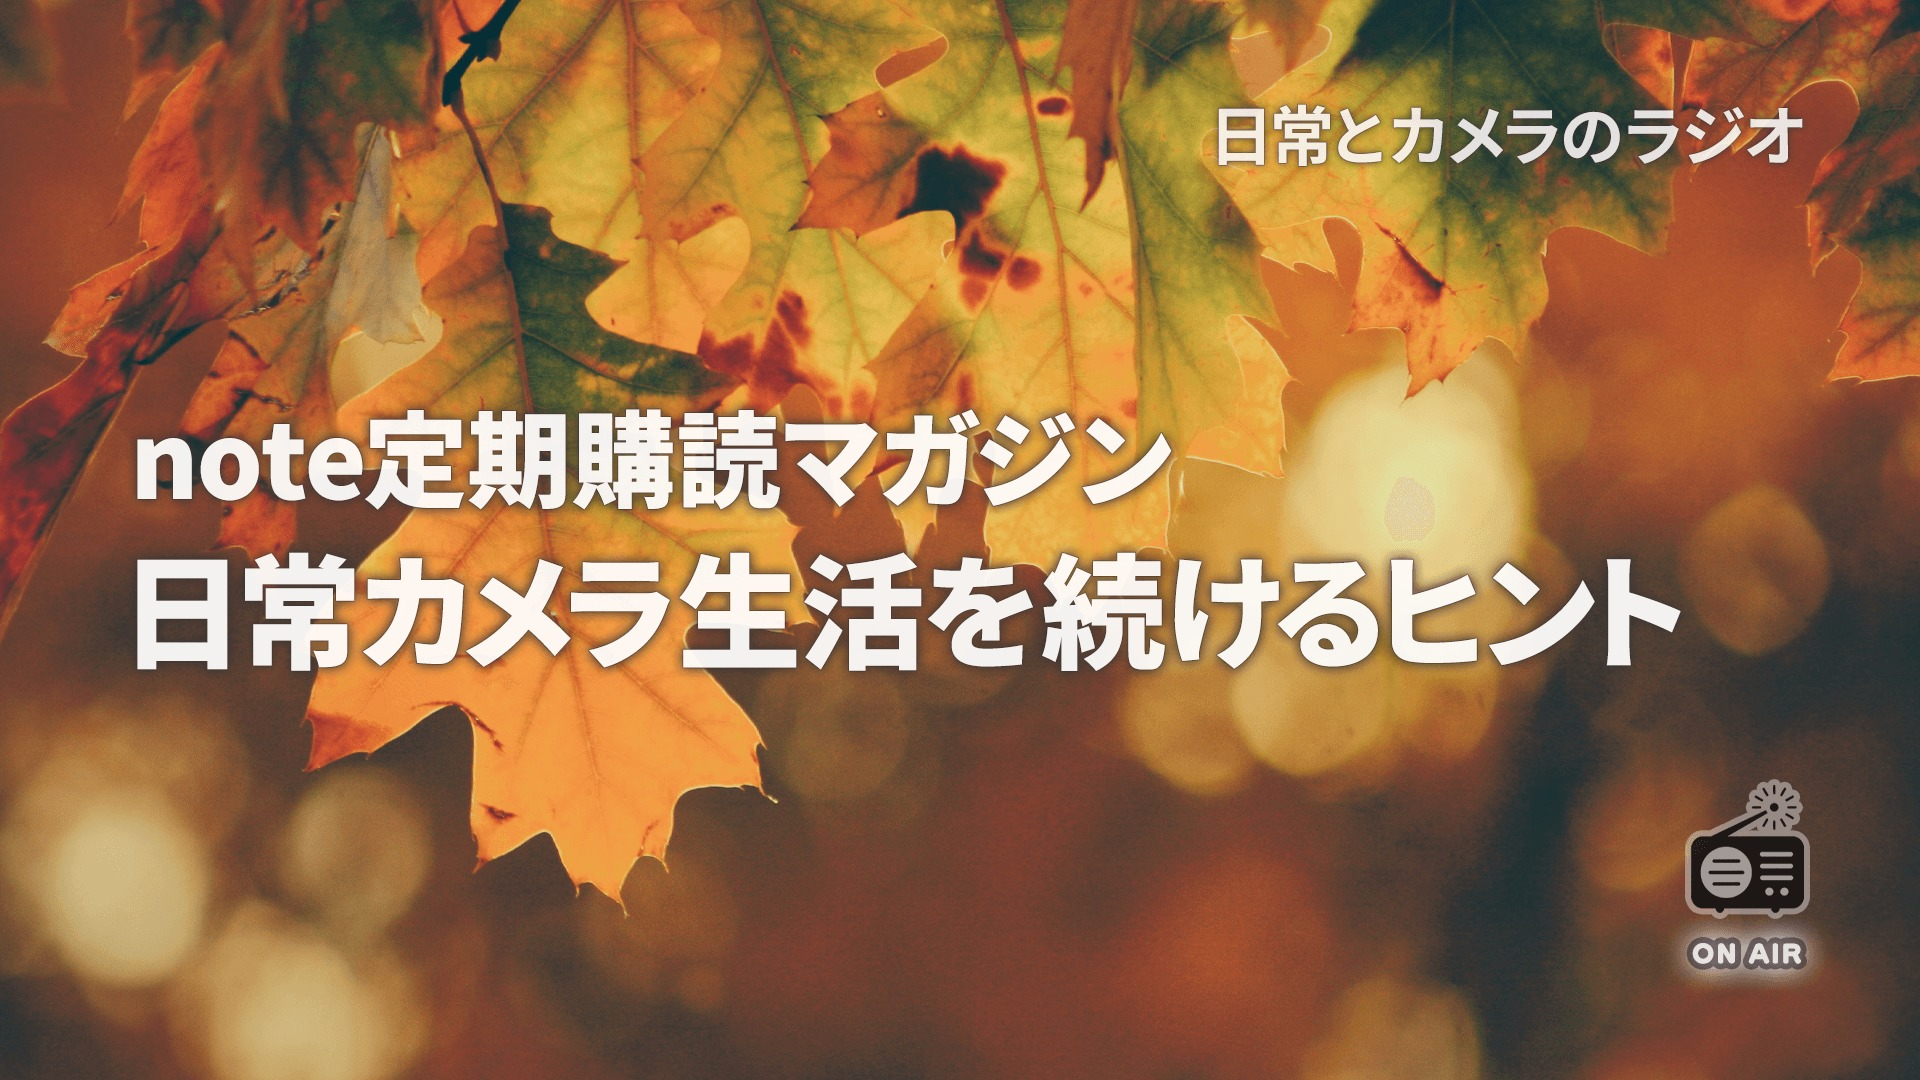 note定期購読マガジン|日常カメラ生活を続けるヒント